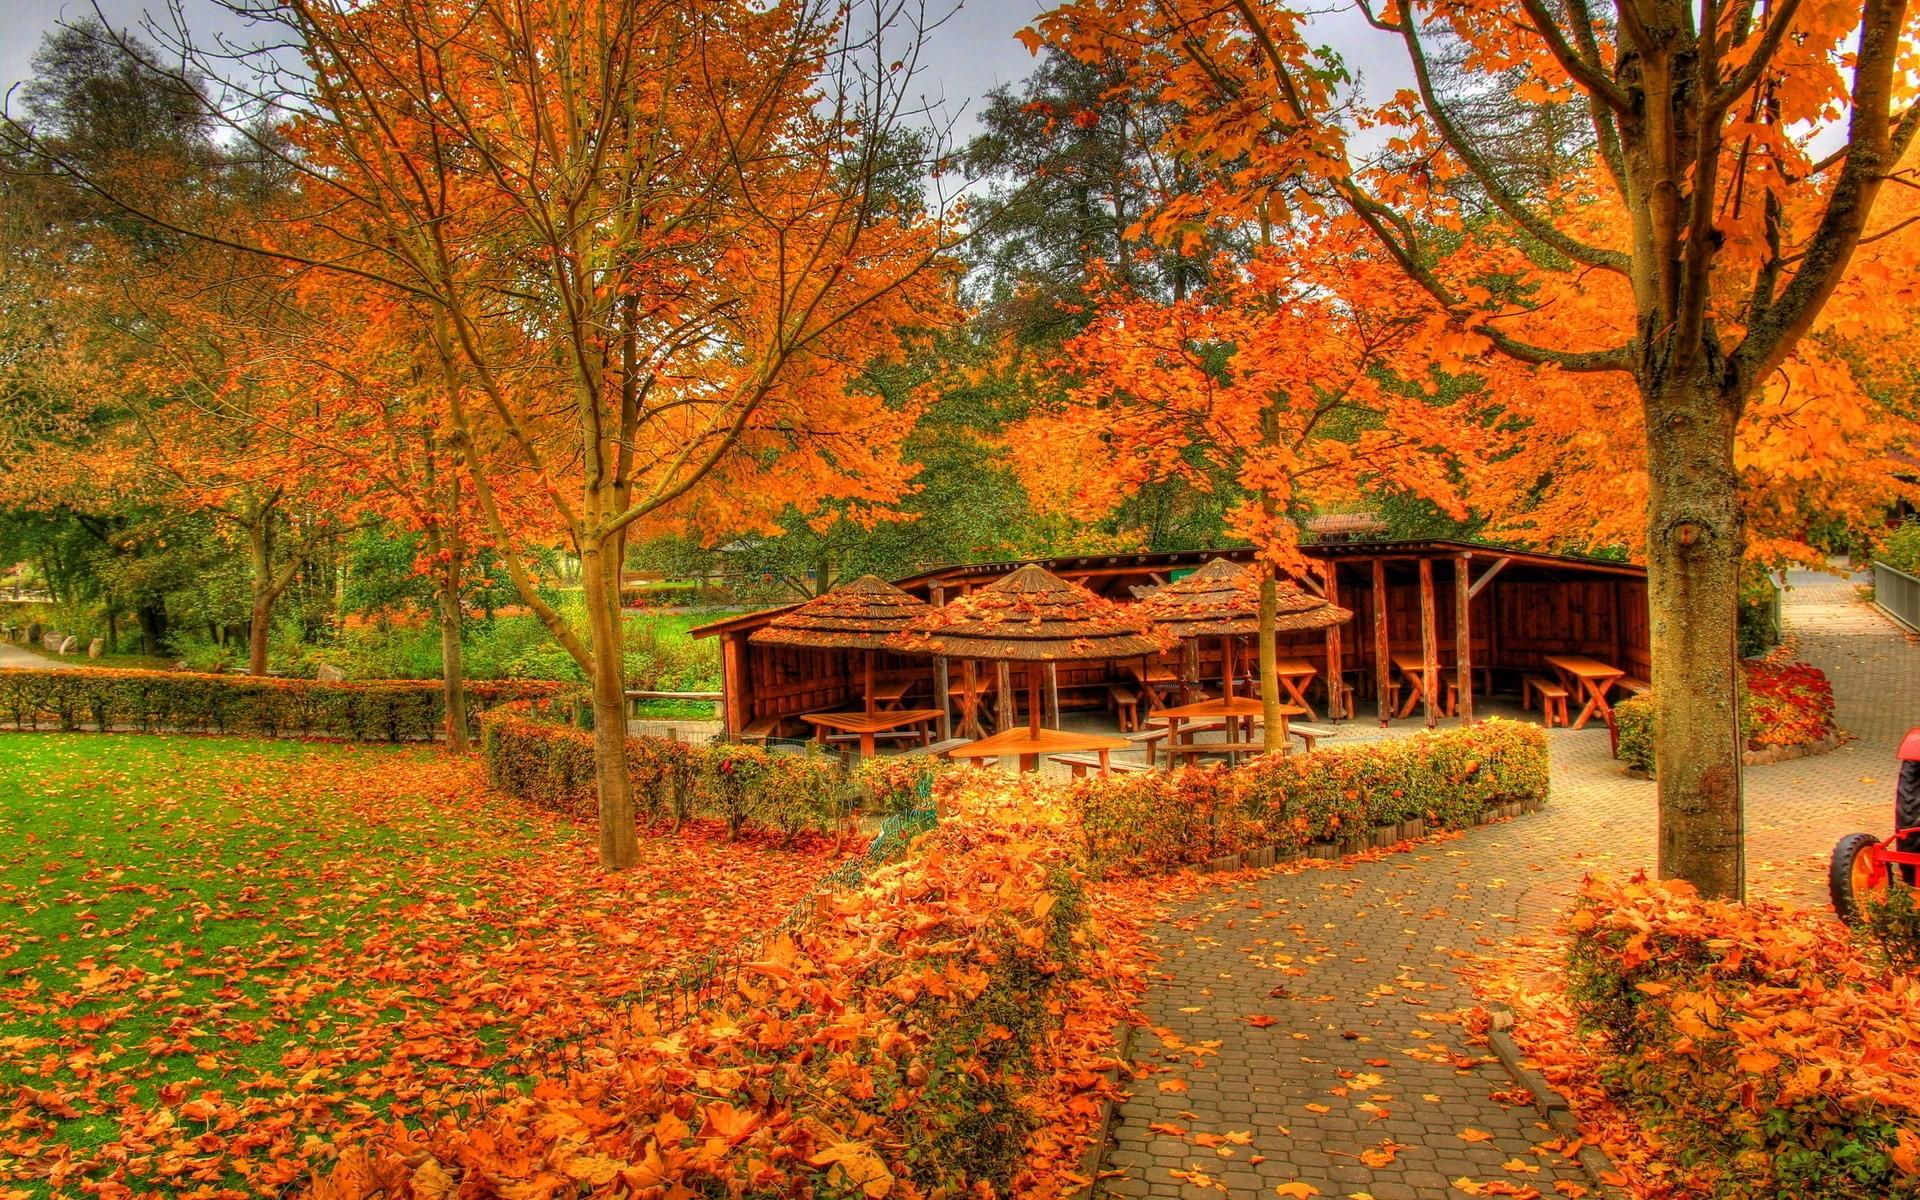 autumn hd widescreen wallpapers backgrounds. autumn widescreen backgrounds